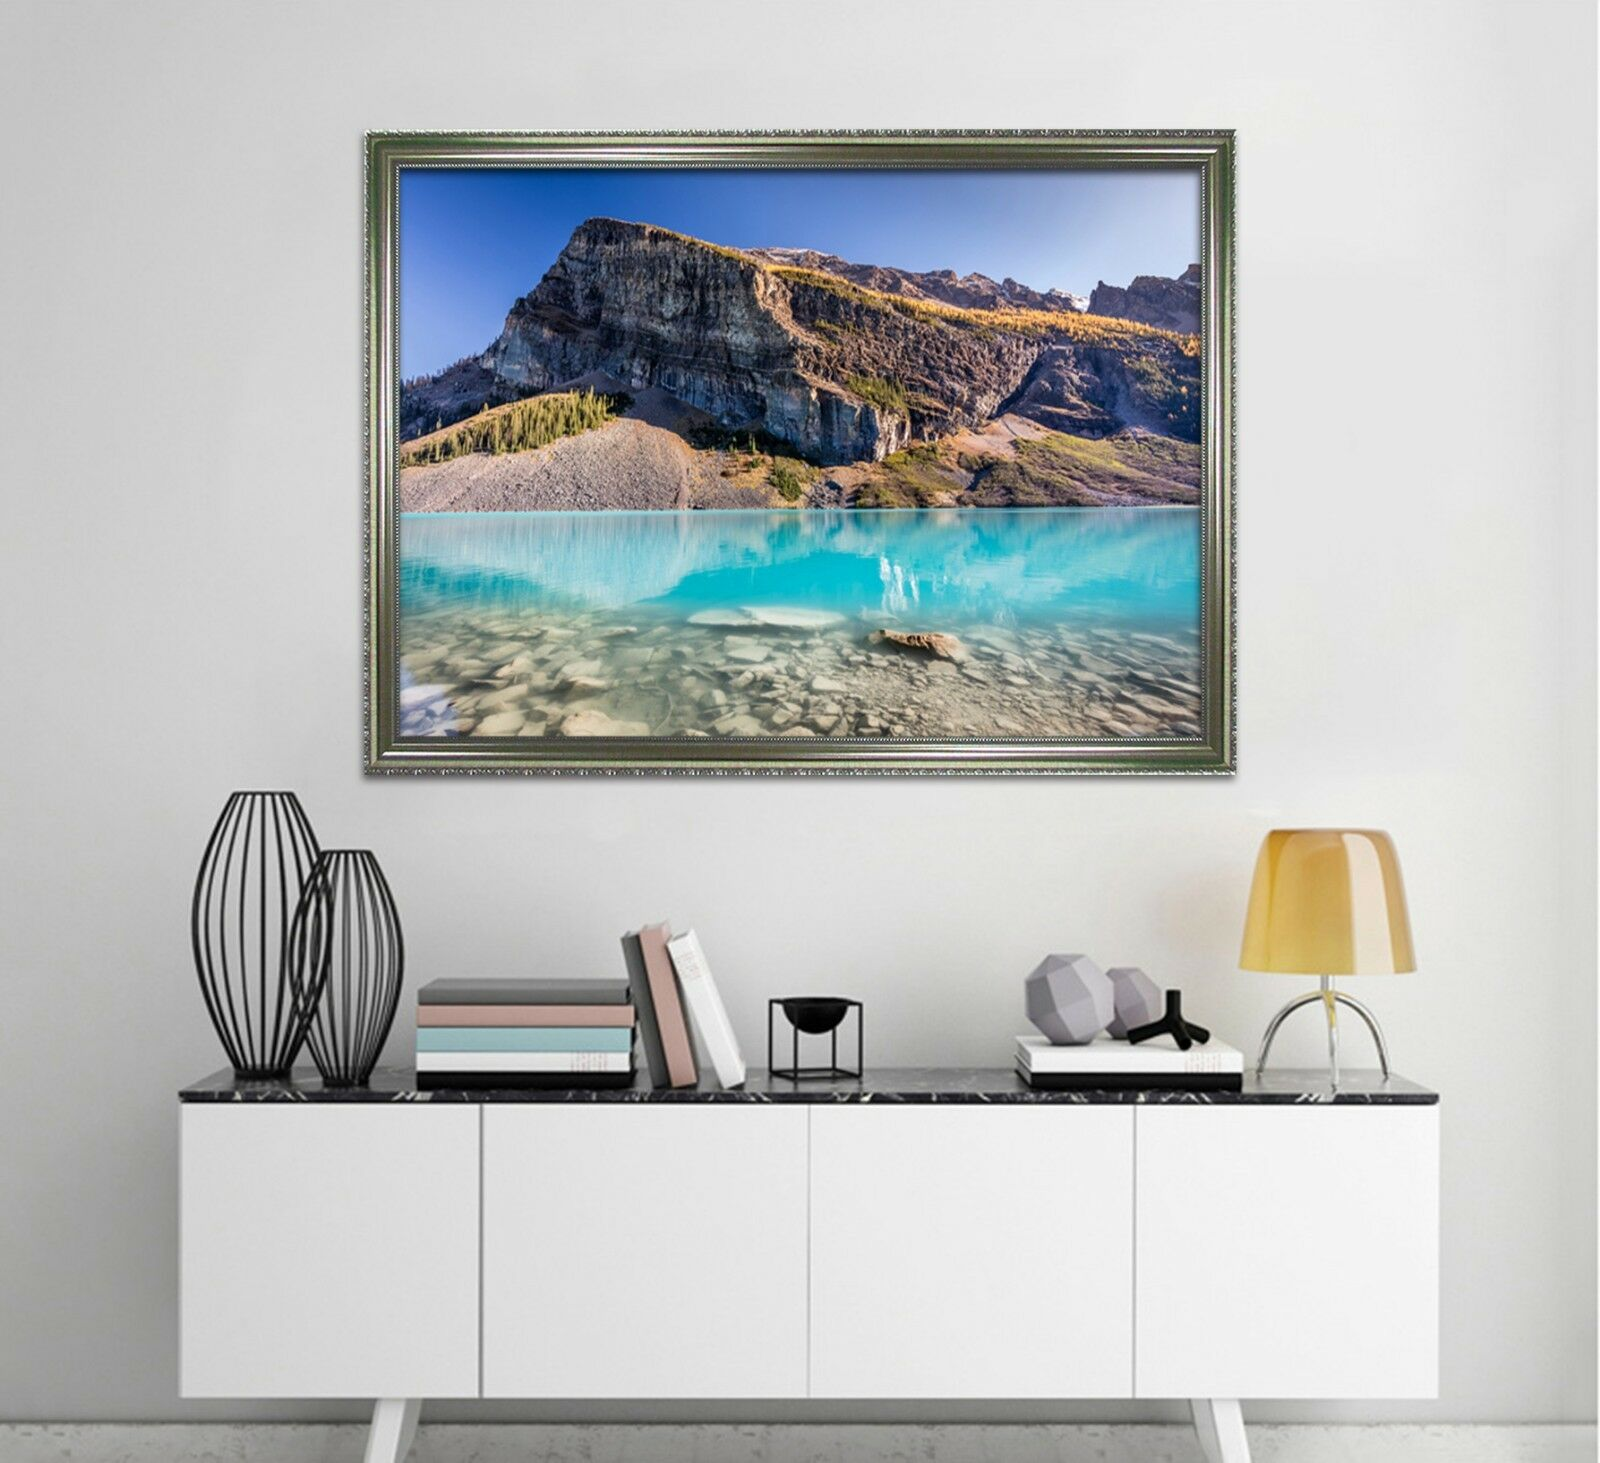 3D Blau Lake Hills 2 Framed Poster Home Decor Print Painting Art AJ WALLAPER